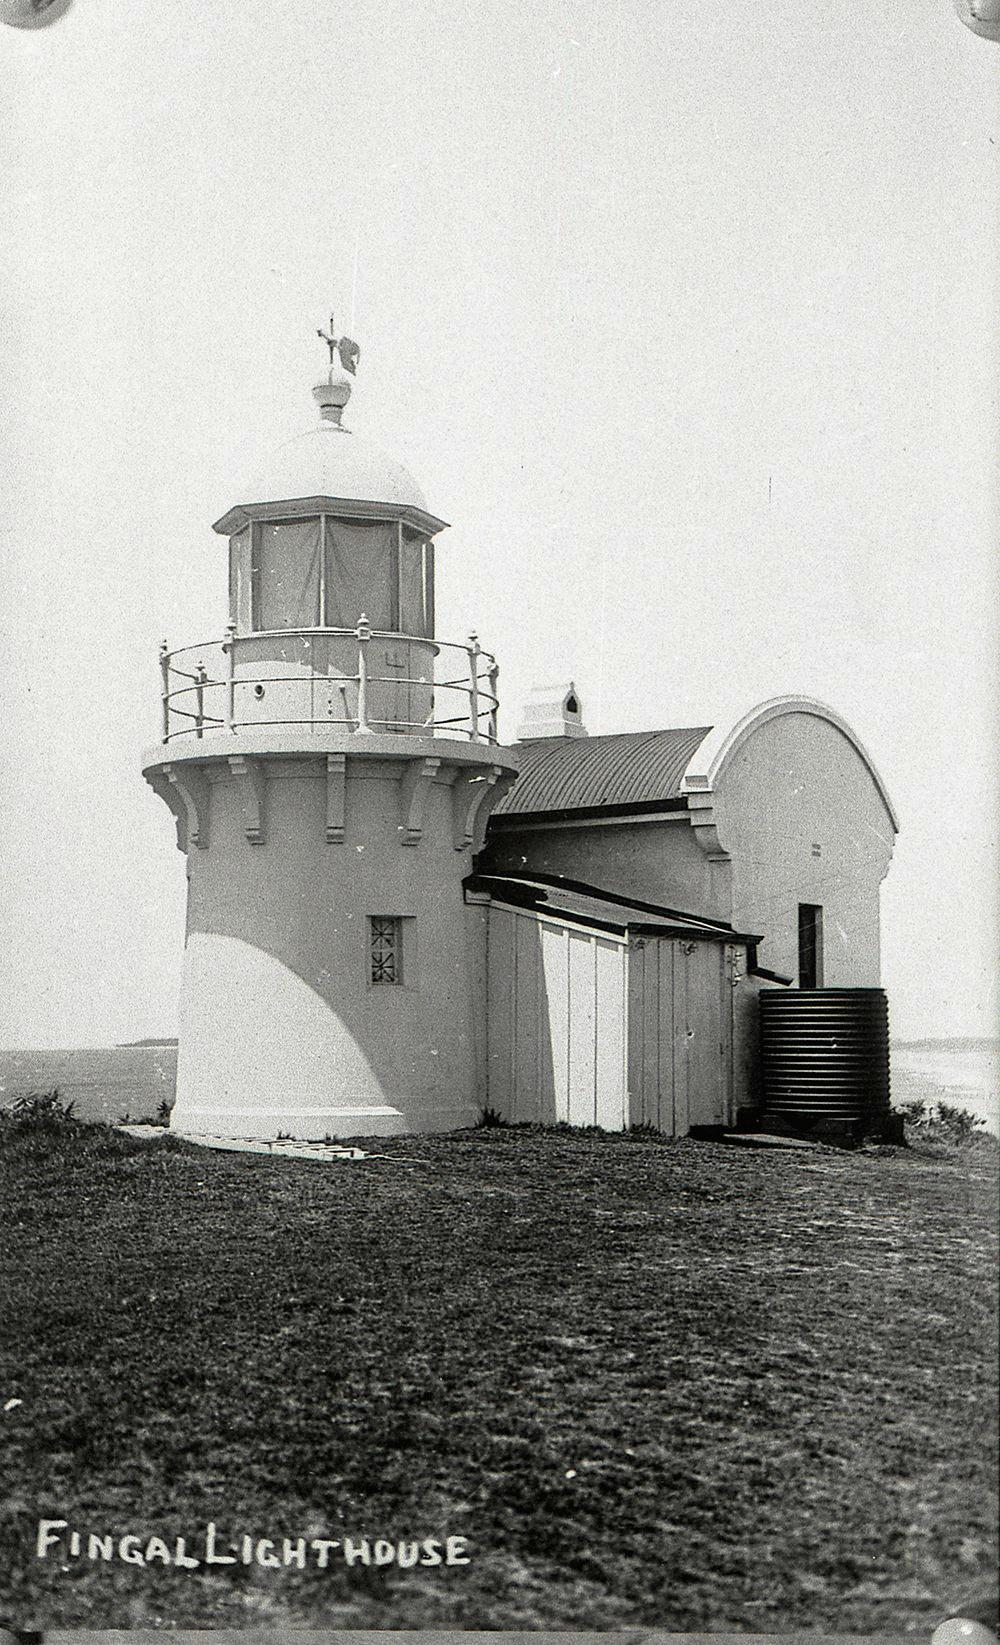 Fingal Lighthouse